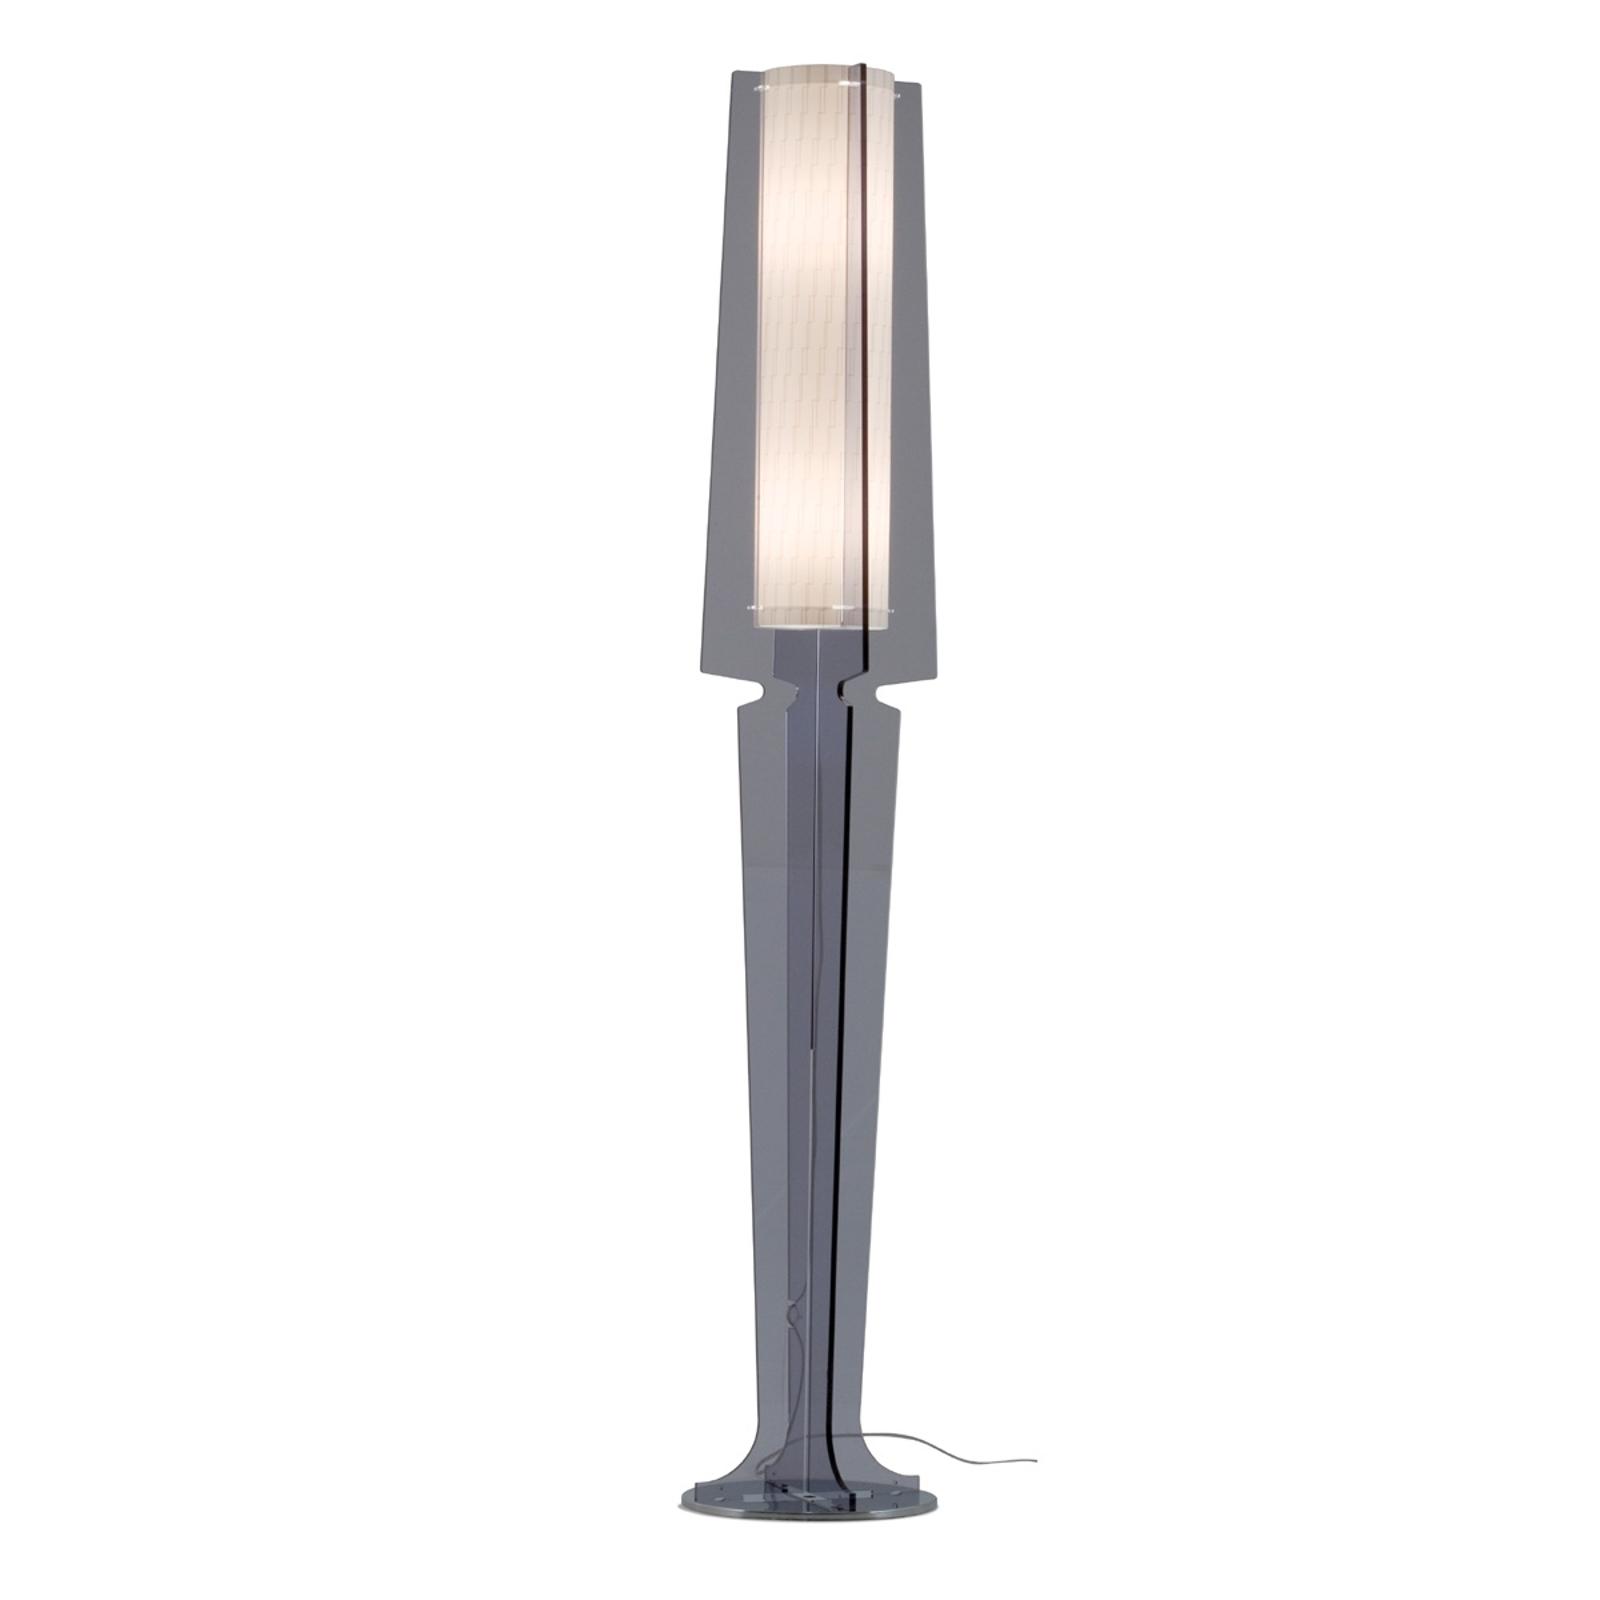 Szara lampa stojąca Dea